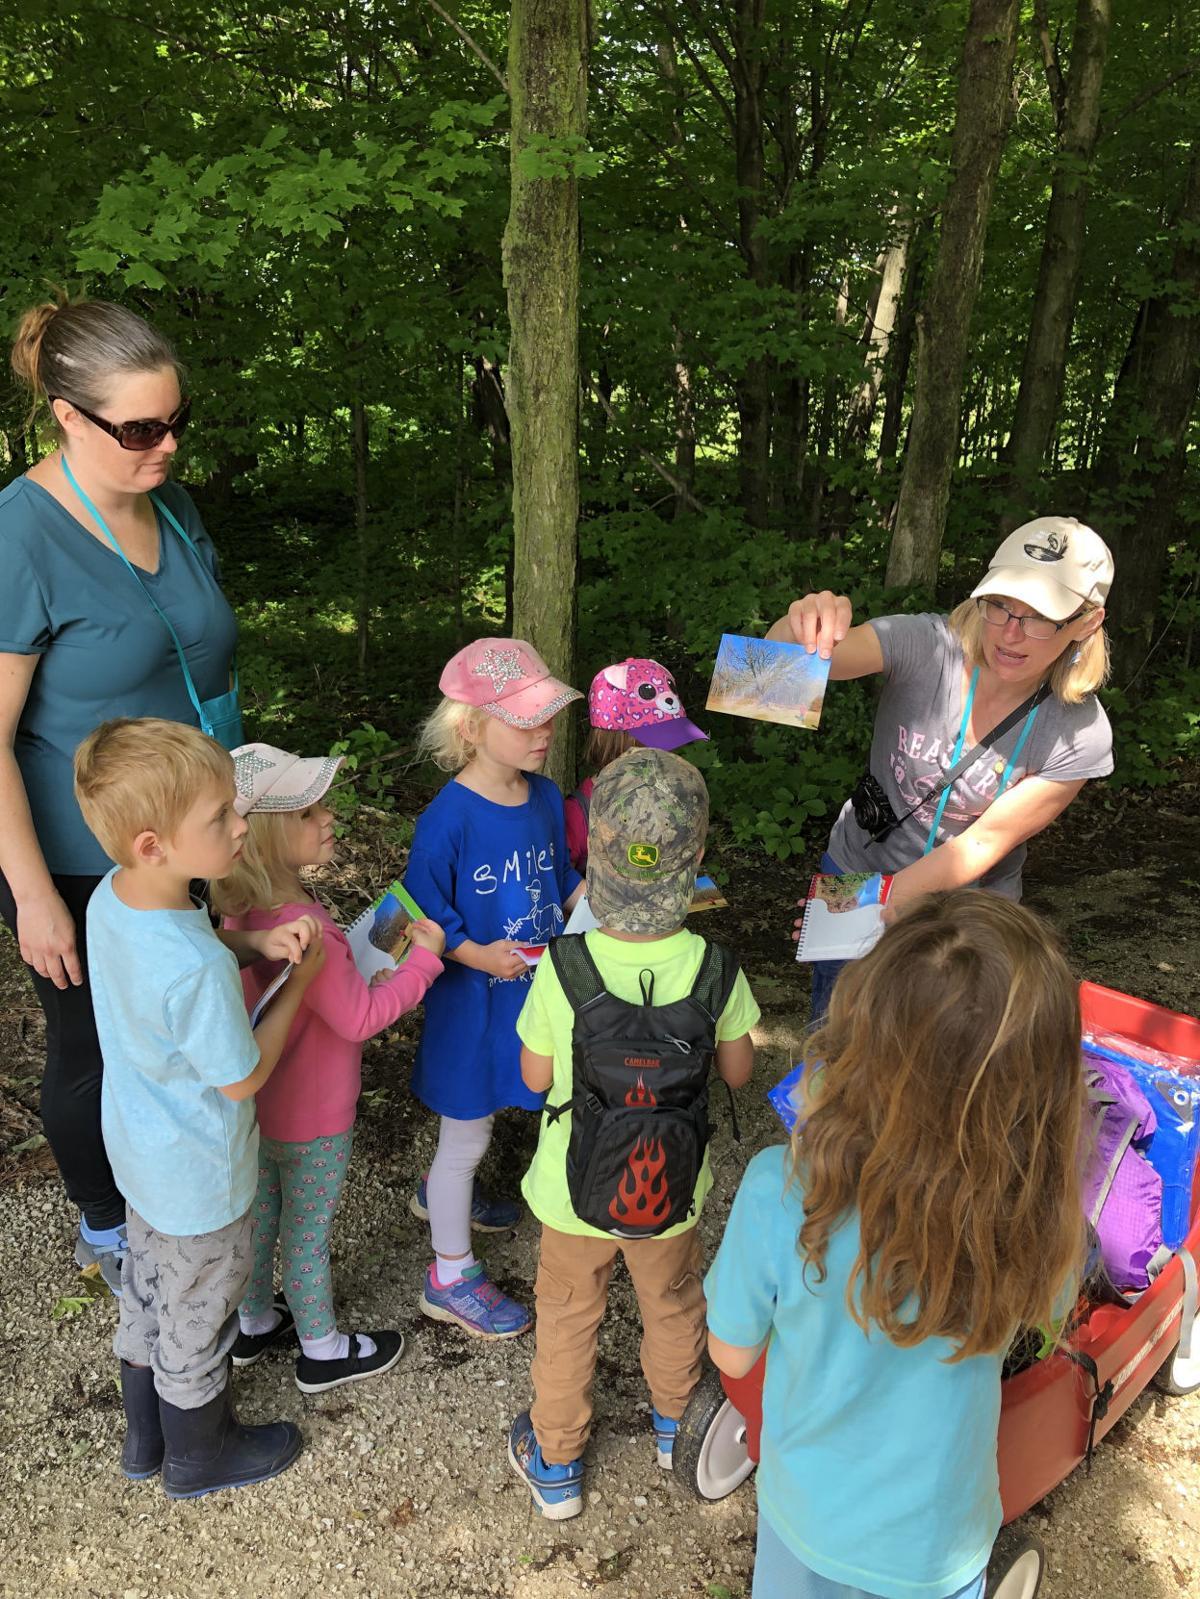 Seno Conservancy In Wheatland Offers Free Summer Program For Kids